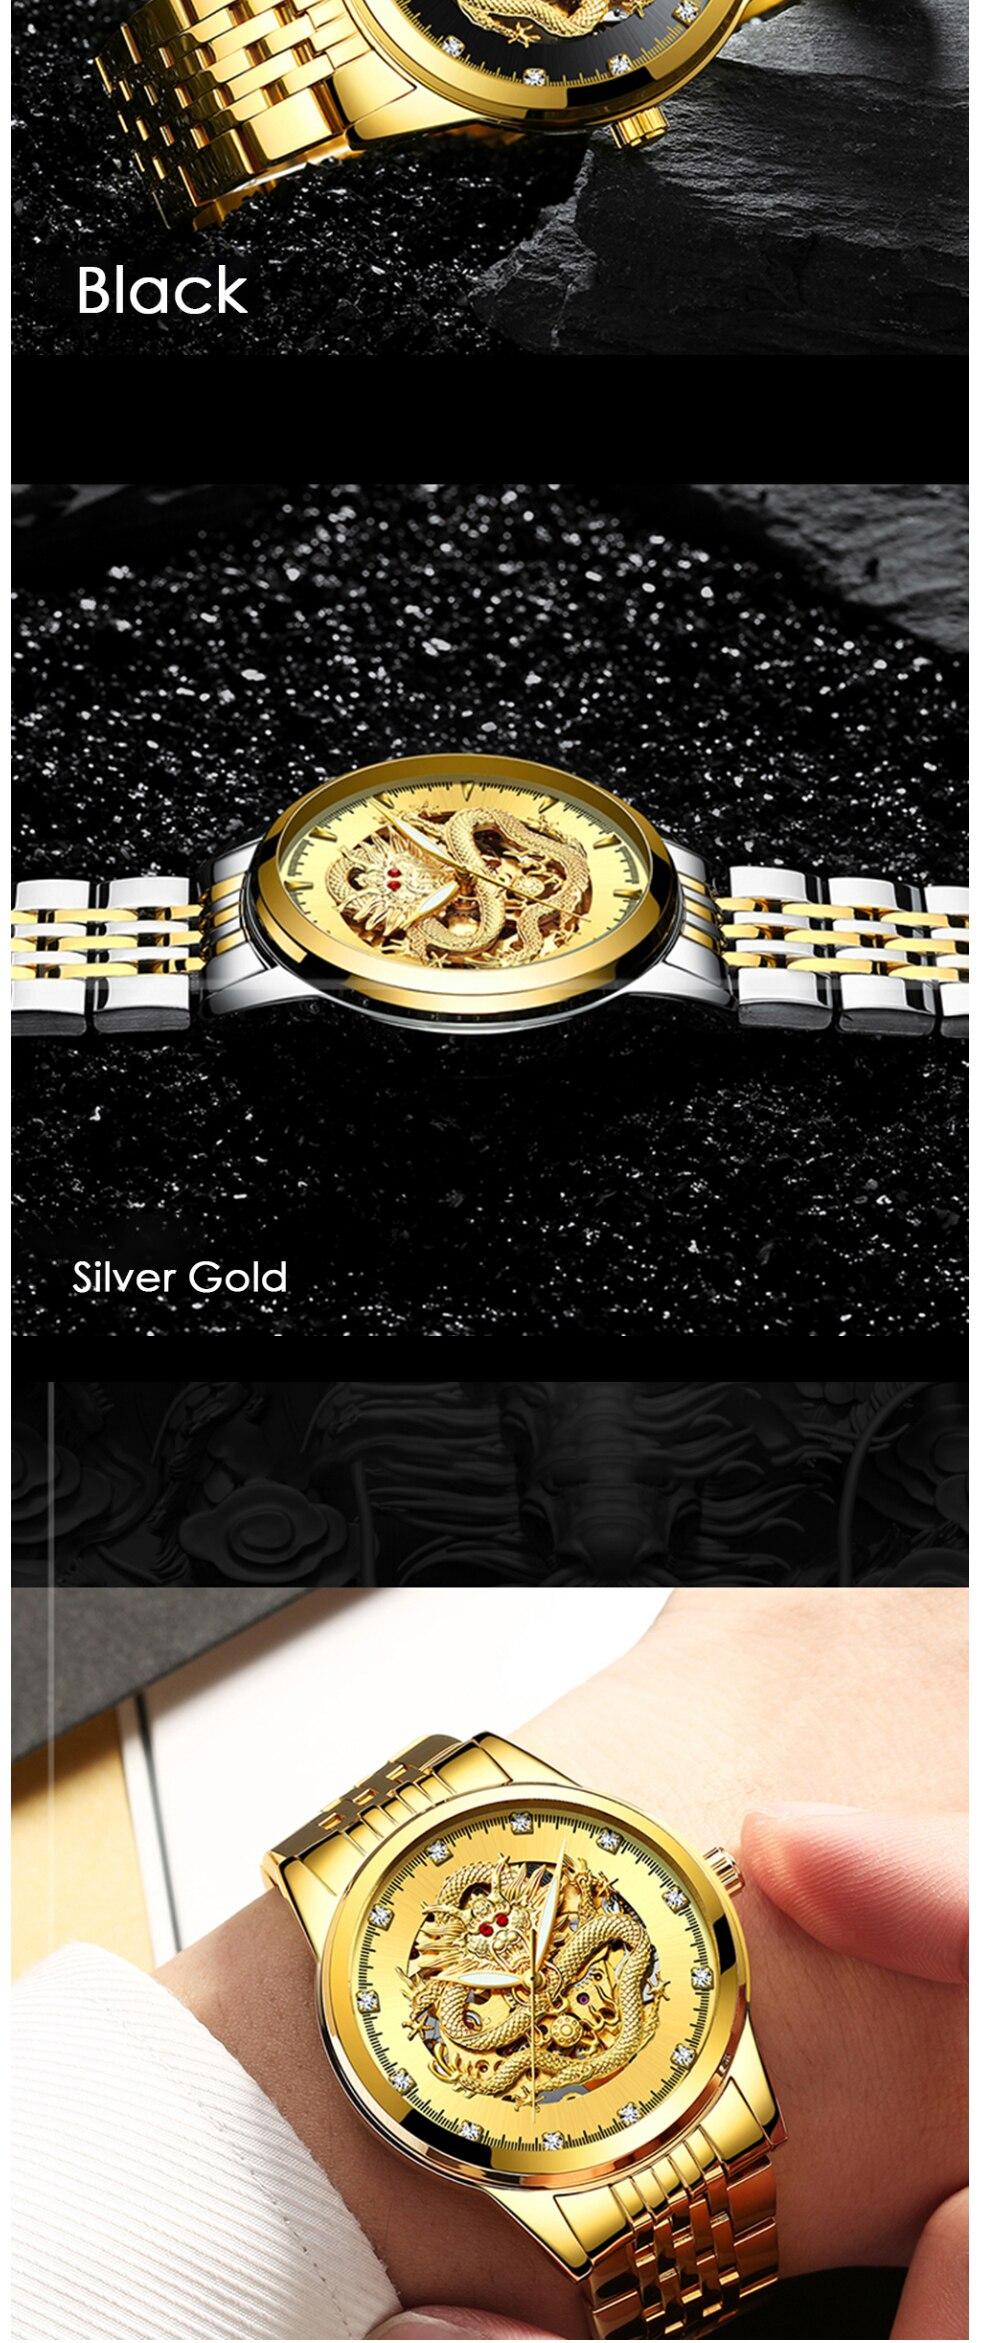 HTB1cCoWXoLrK1Rjy1zbq6AenFXaR TEVISE Men Mechanical Watch Luxurious Automatic Winding Watches Waterproof Skeleton Hollow Gold Dragon Clock Relogio Masculino